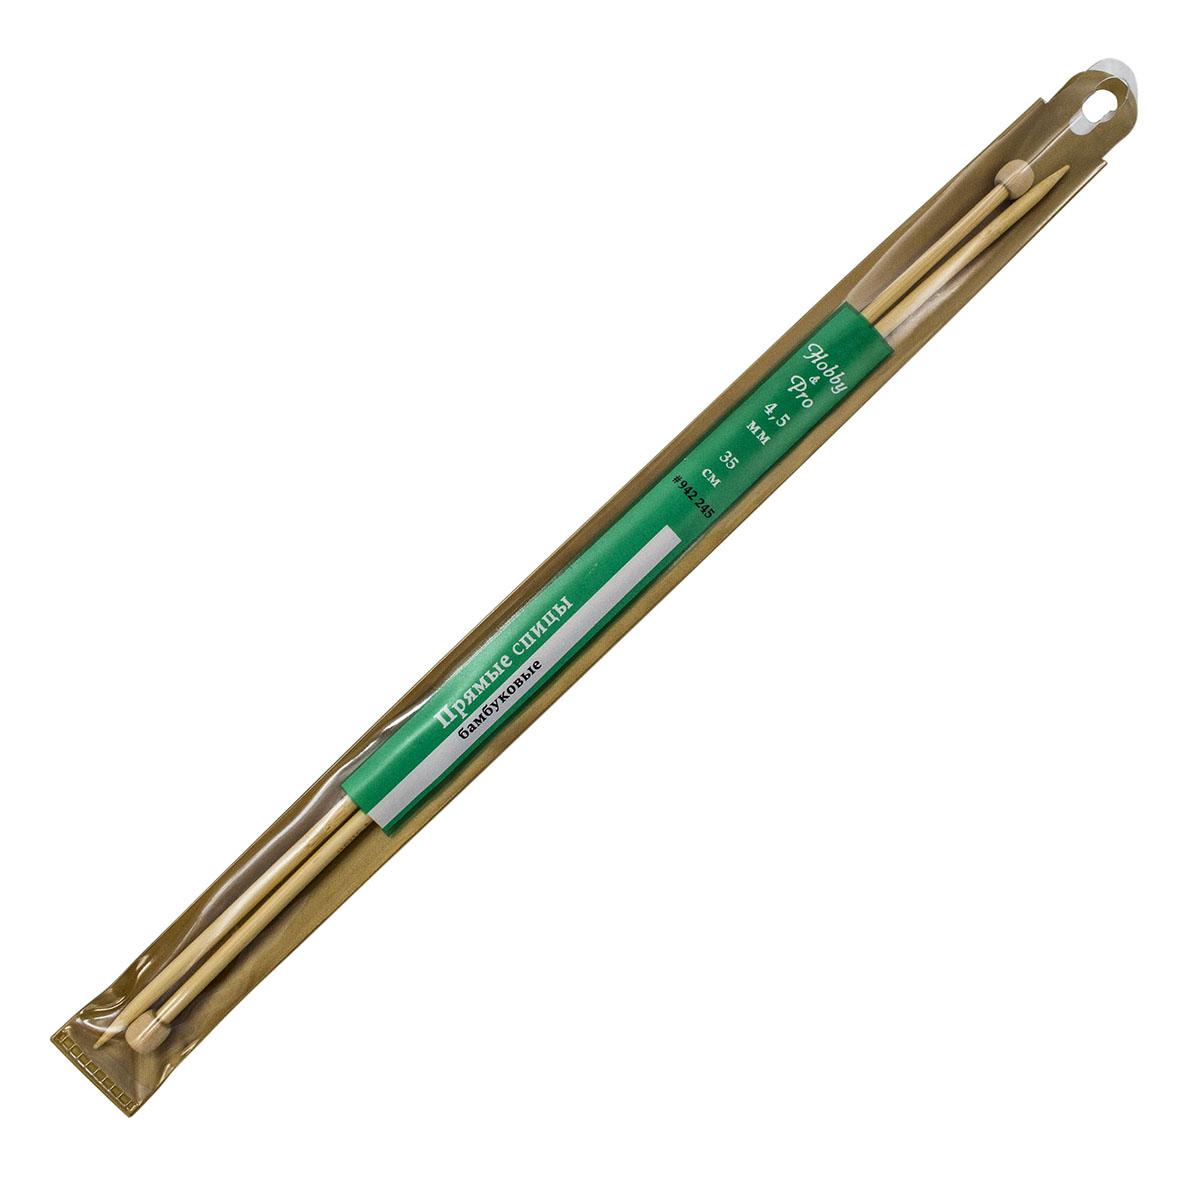 Спицы прямые бамбук 942245, 35 см, 4,5 мм, Hobby&Pro